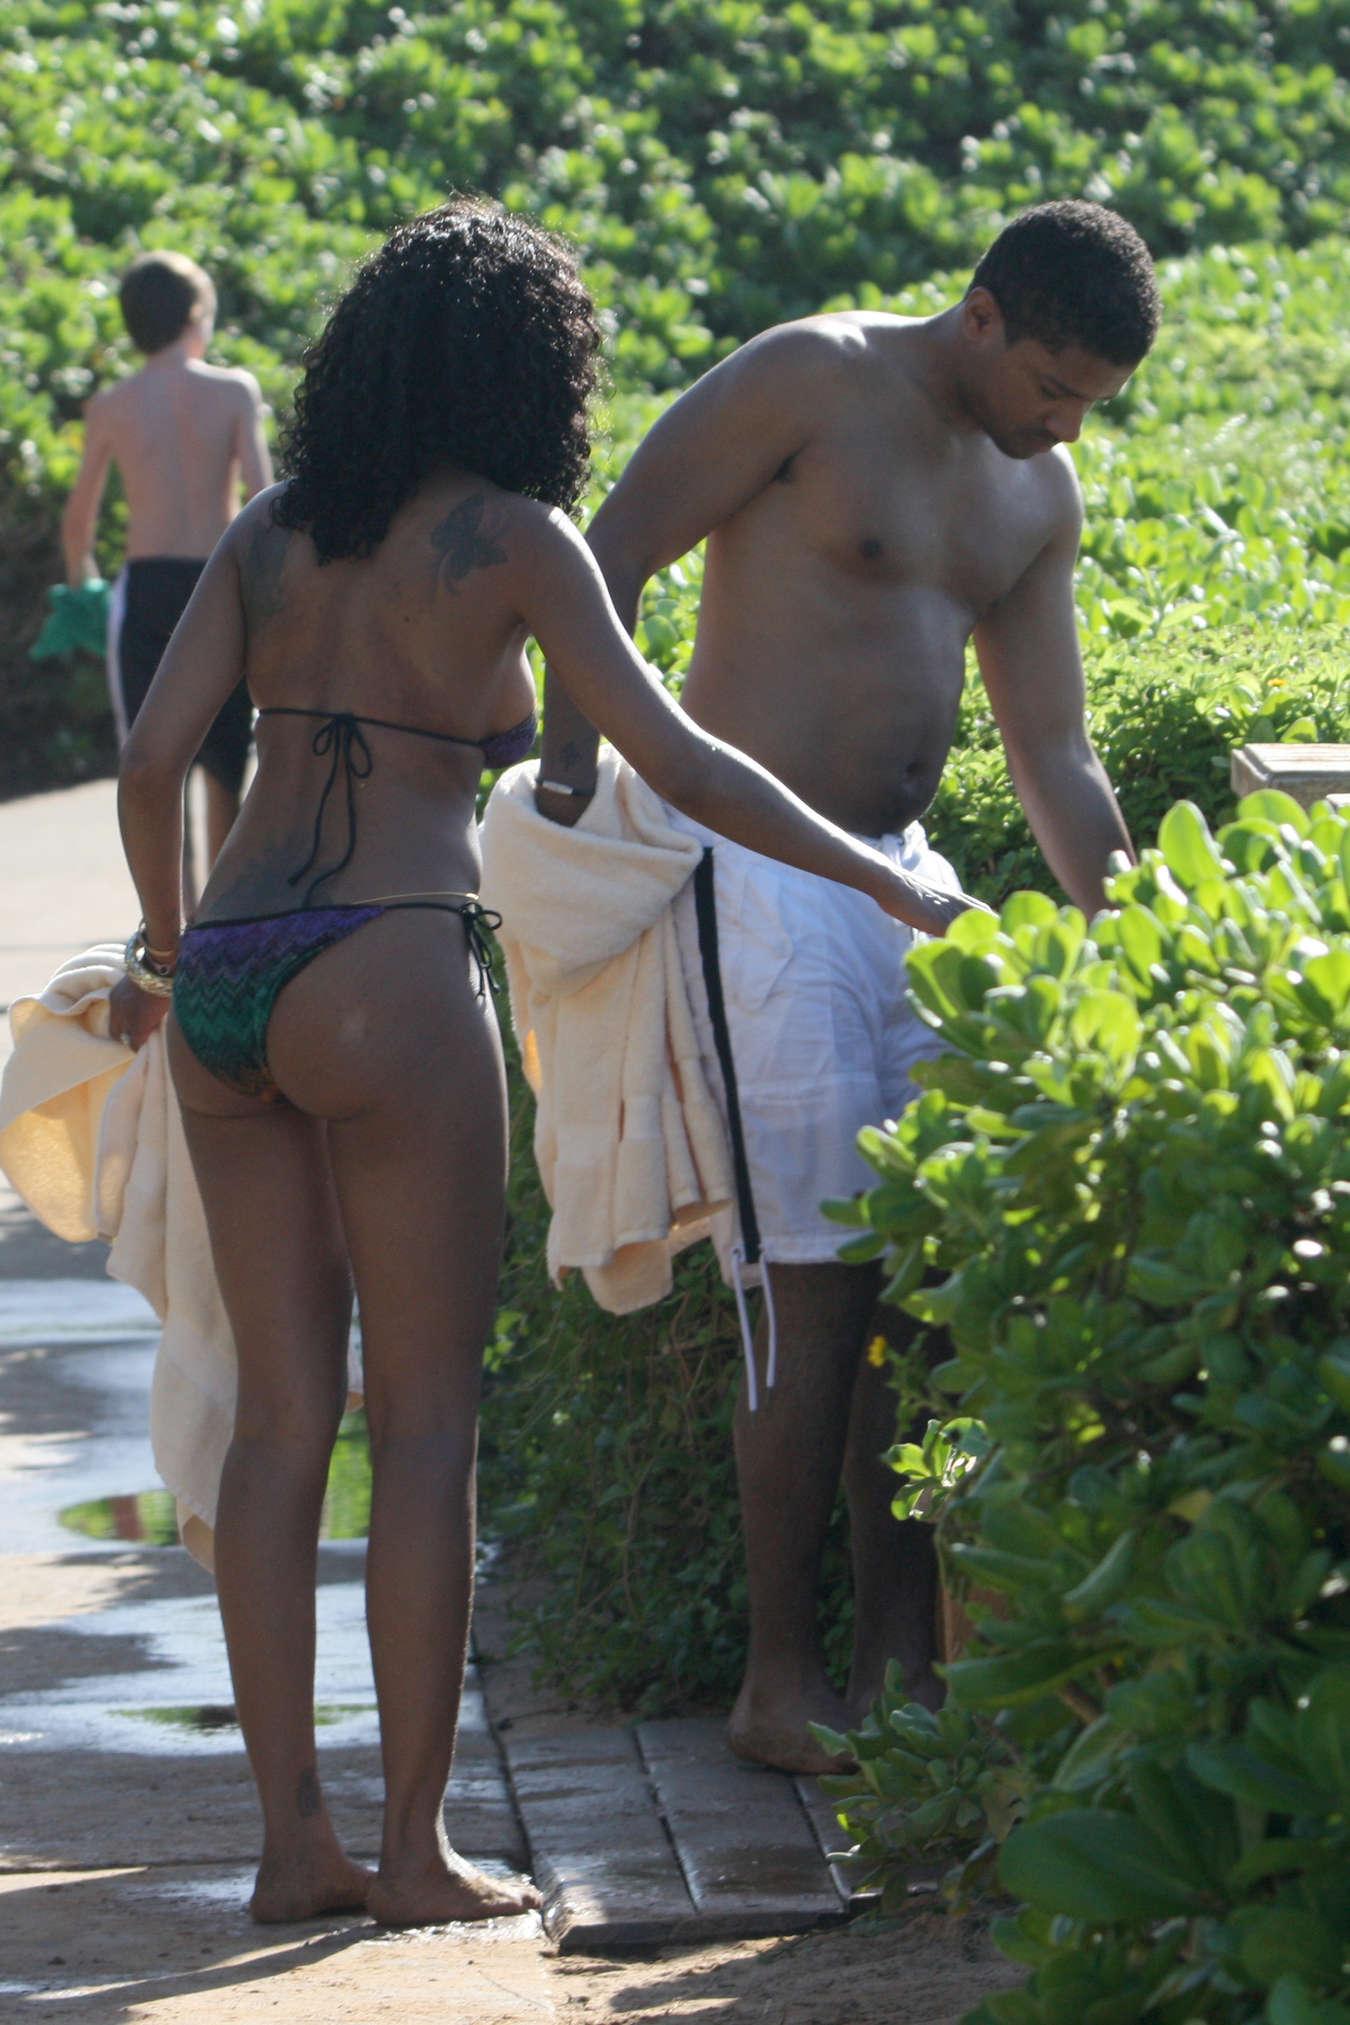 Swimsuit Brandy Norwood nudes (15 photo) Gallery, Facebook, bra